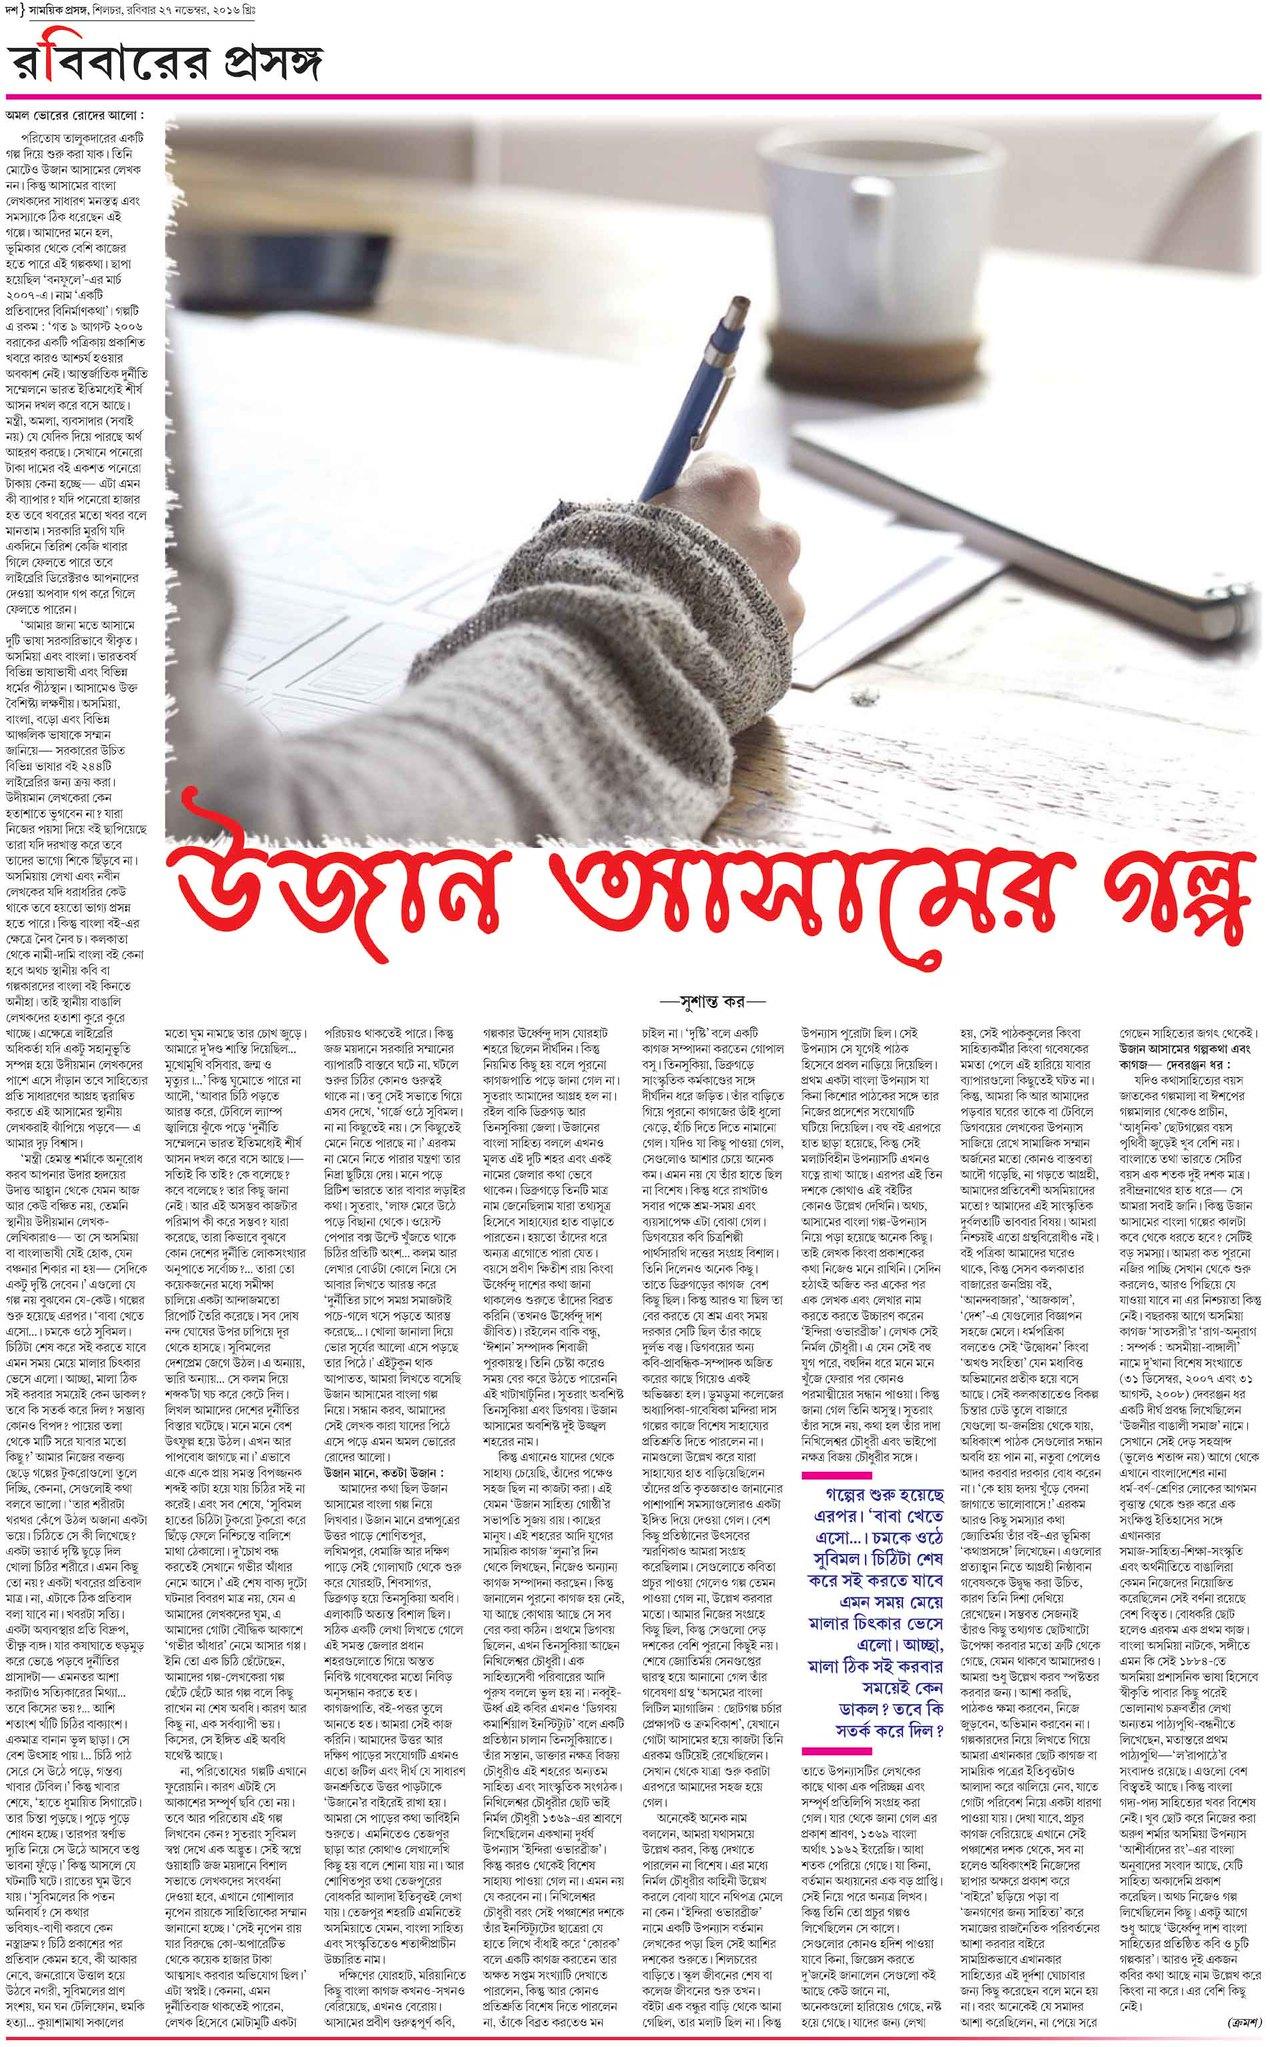 Ujan Asamer Bangla Samayik Prosongo 01